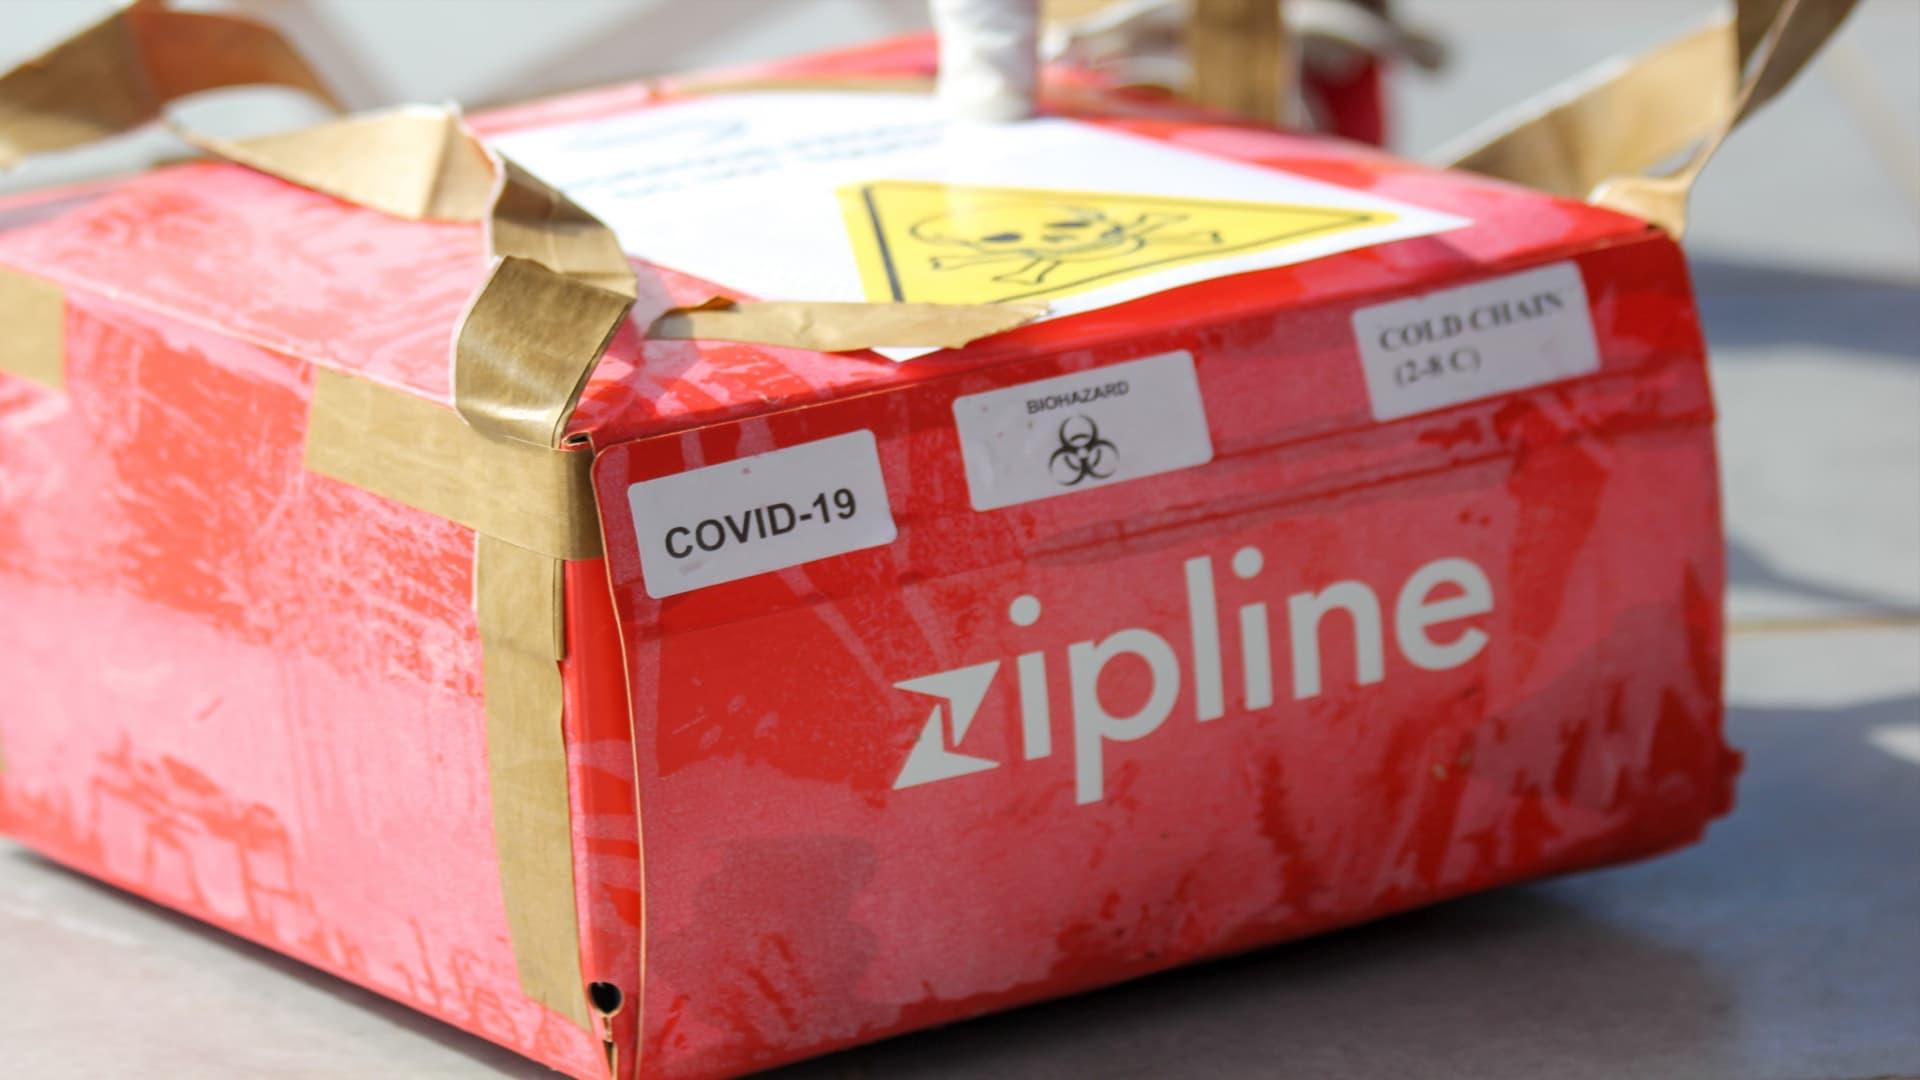 A Covid-19 test sample delivered by Zipline